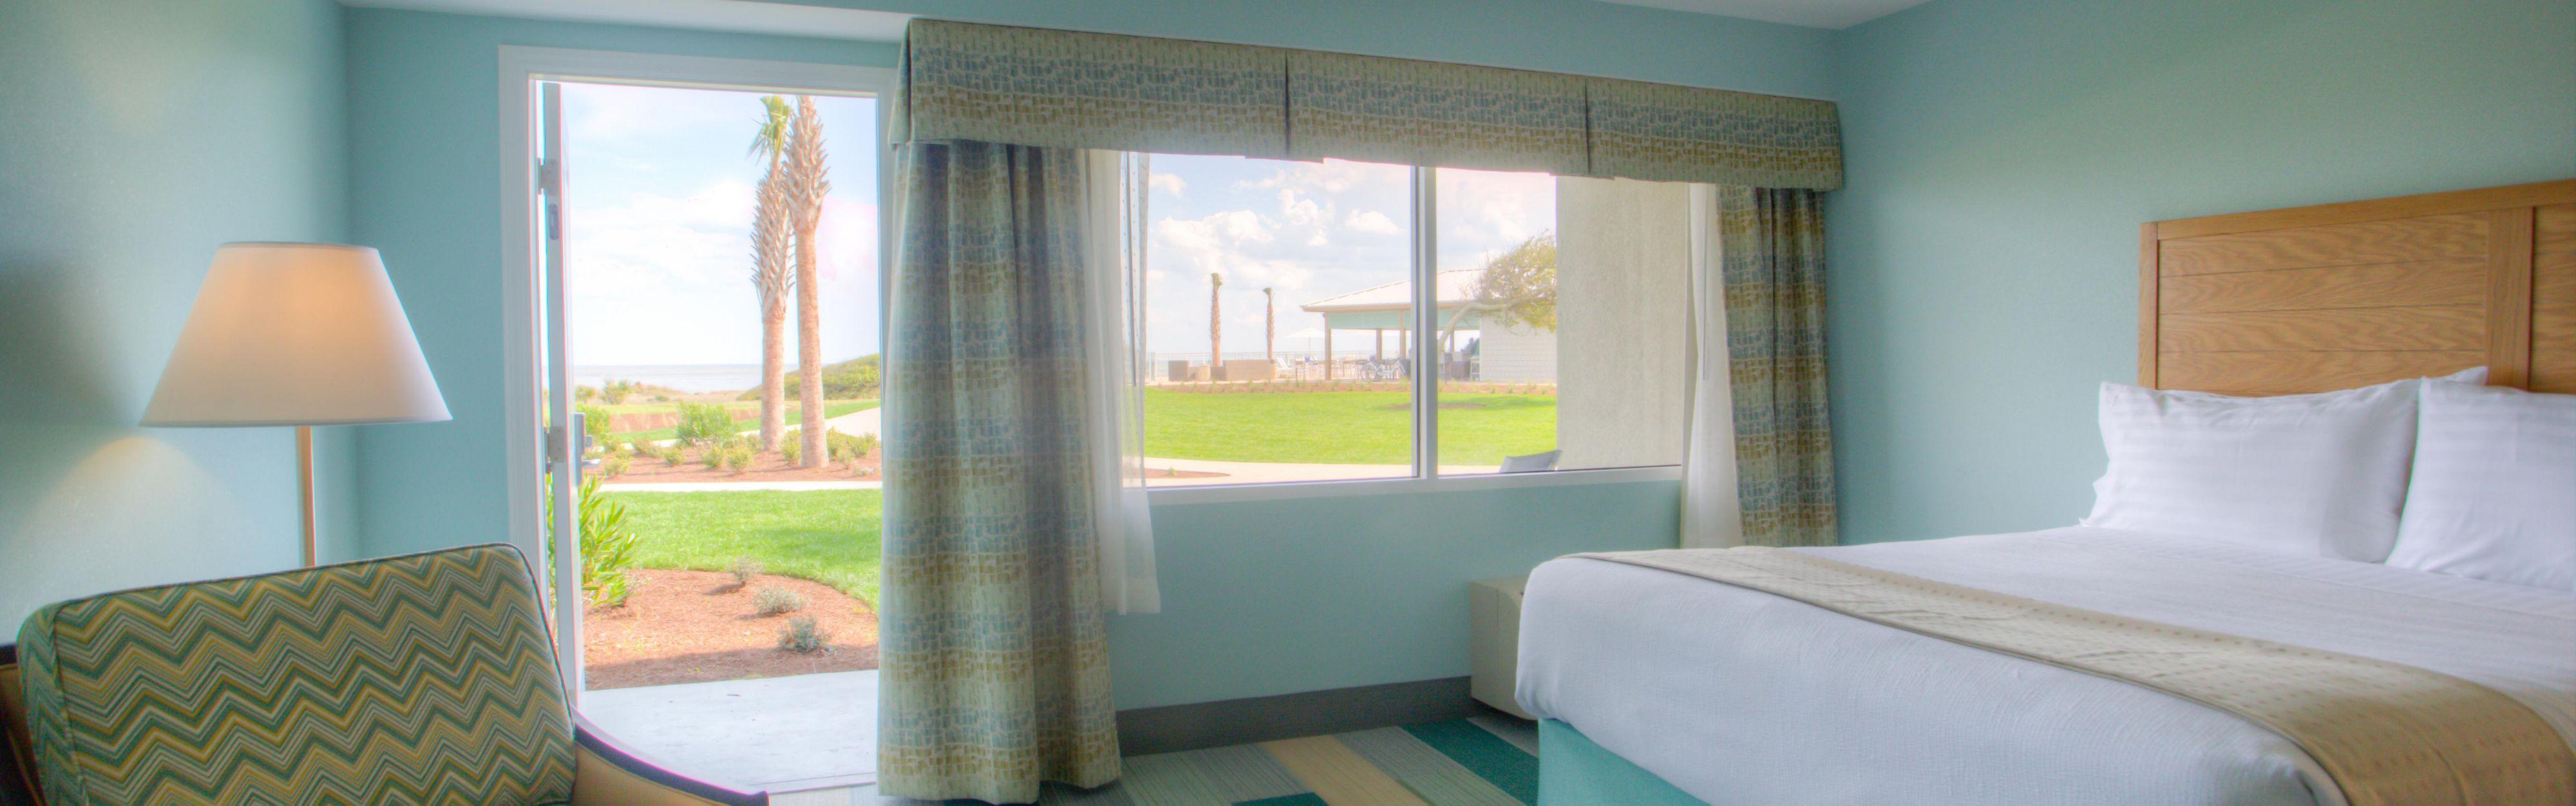 Holiday Inn Resort Jekyll Island image 1